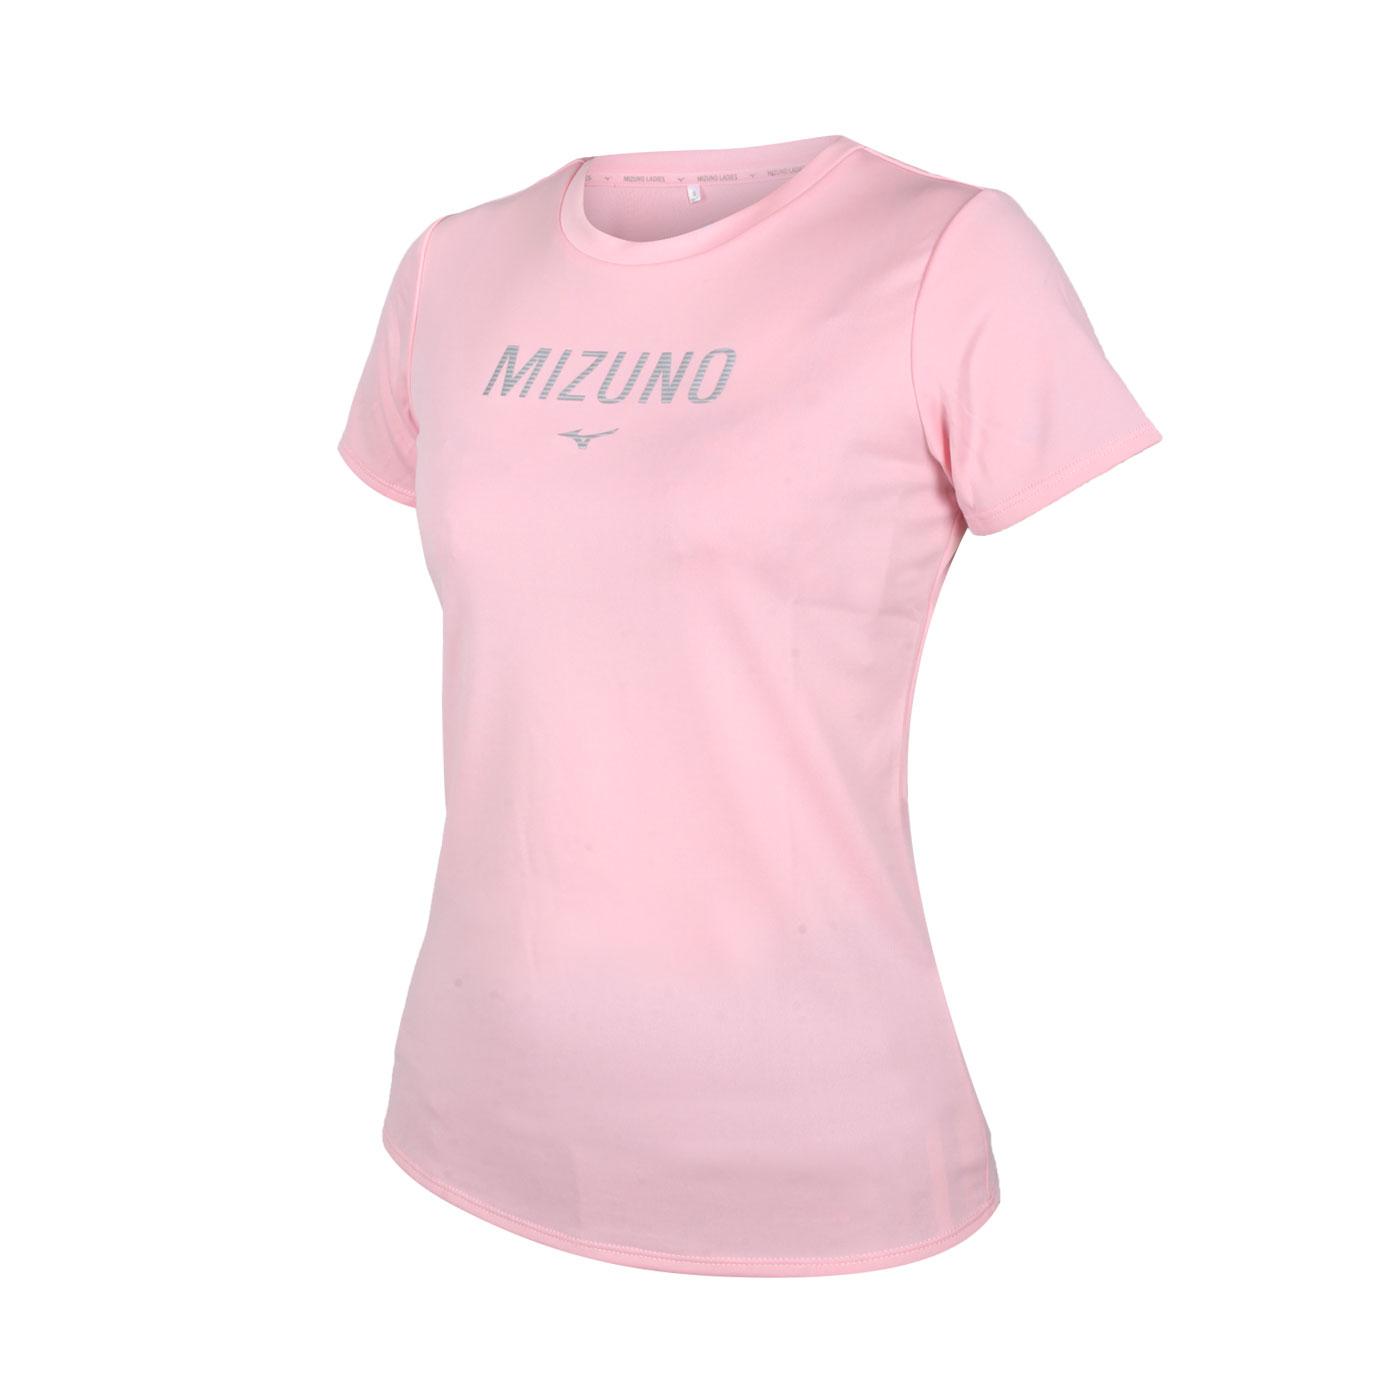 MIZUNO 女款短袖T恤 32TA120166